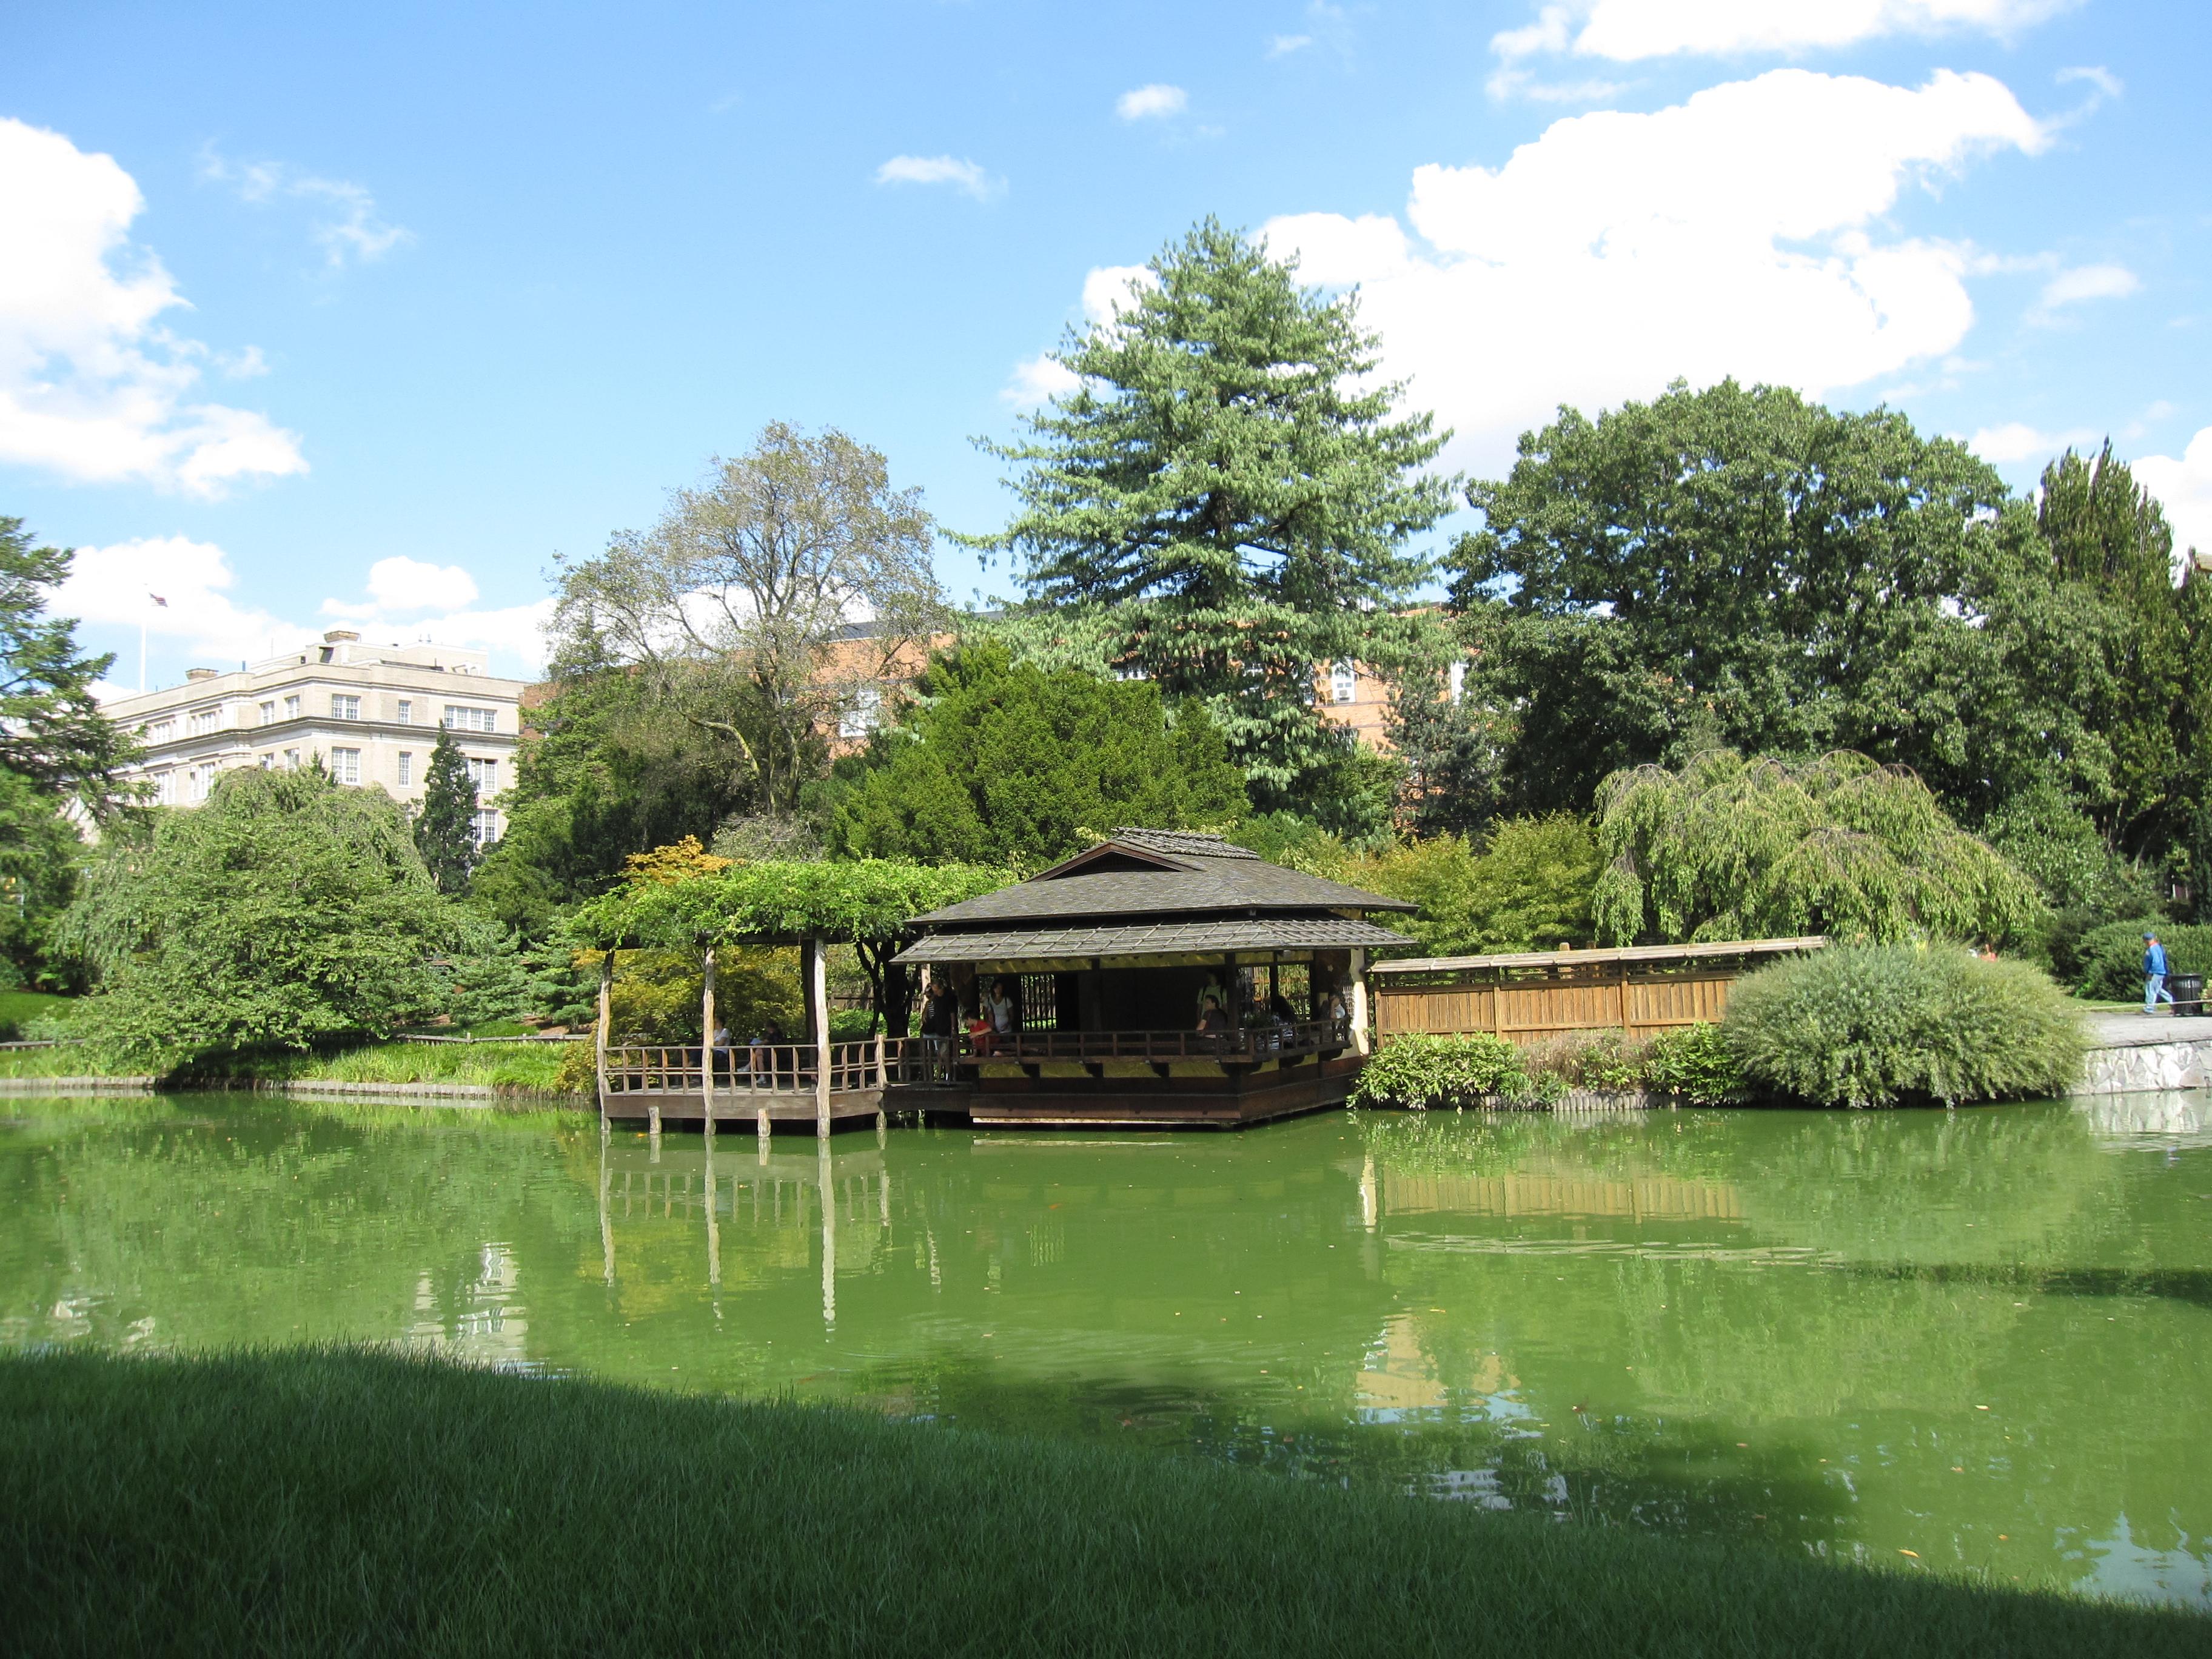 Garden in august in a garden - File Brooklyn Botanic Garden 6 Jpg